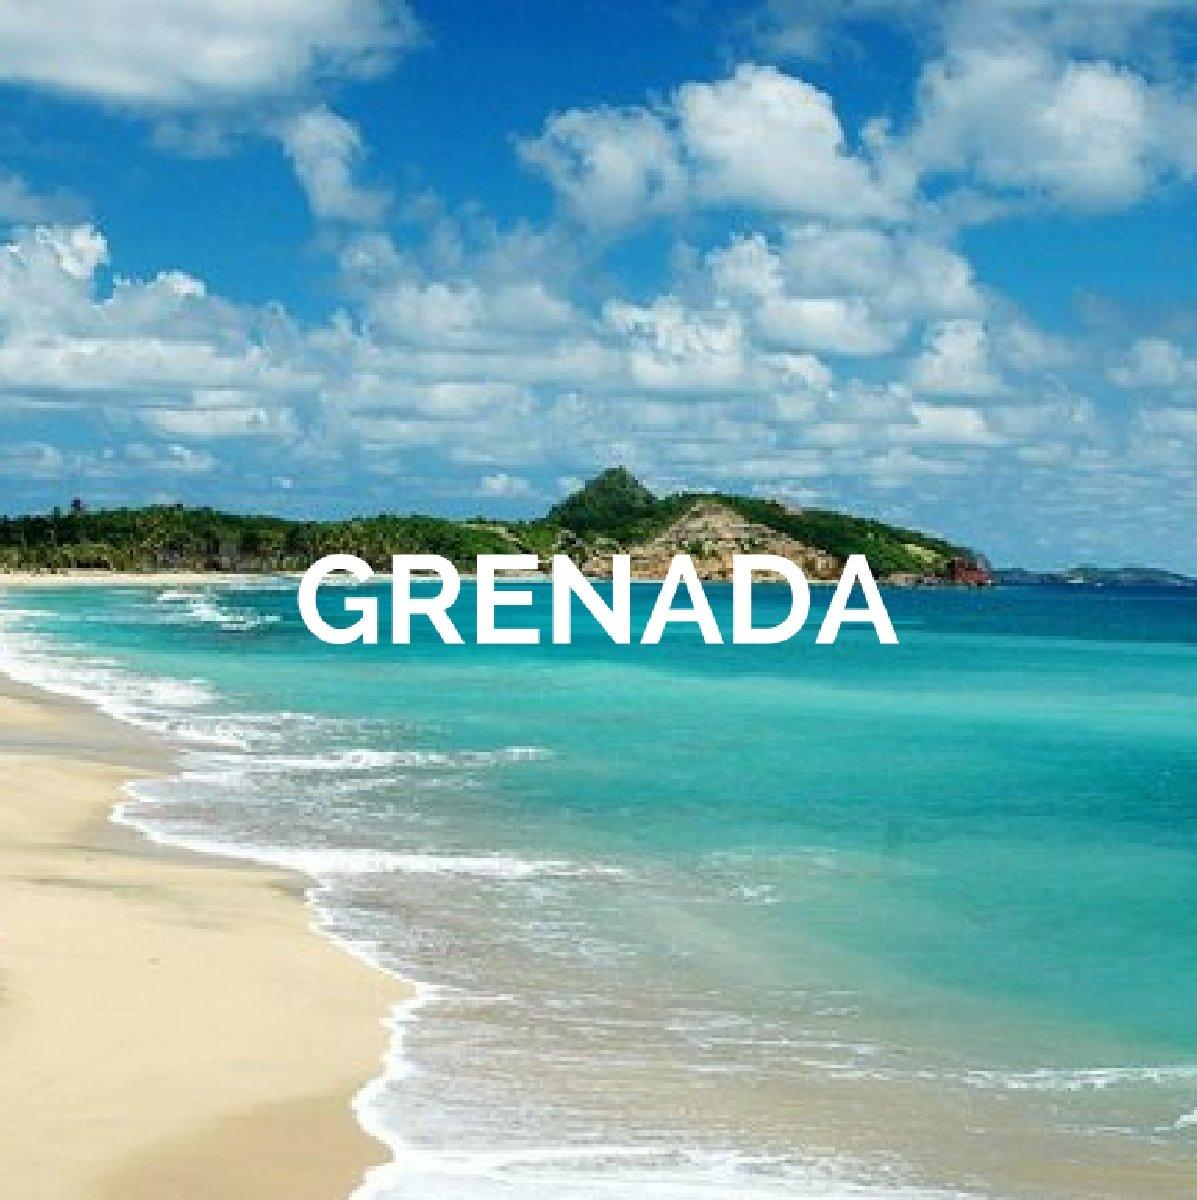 grenada-dominica-sailing-charters